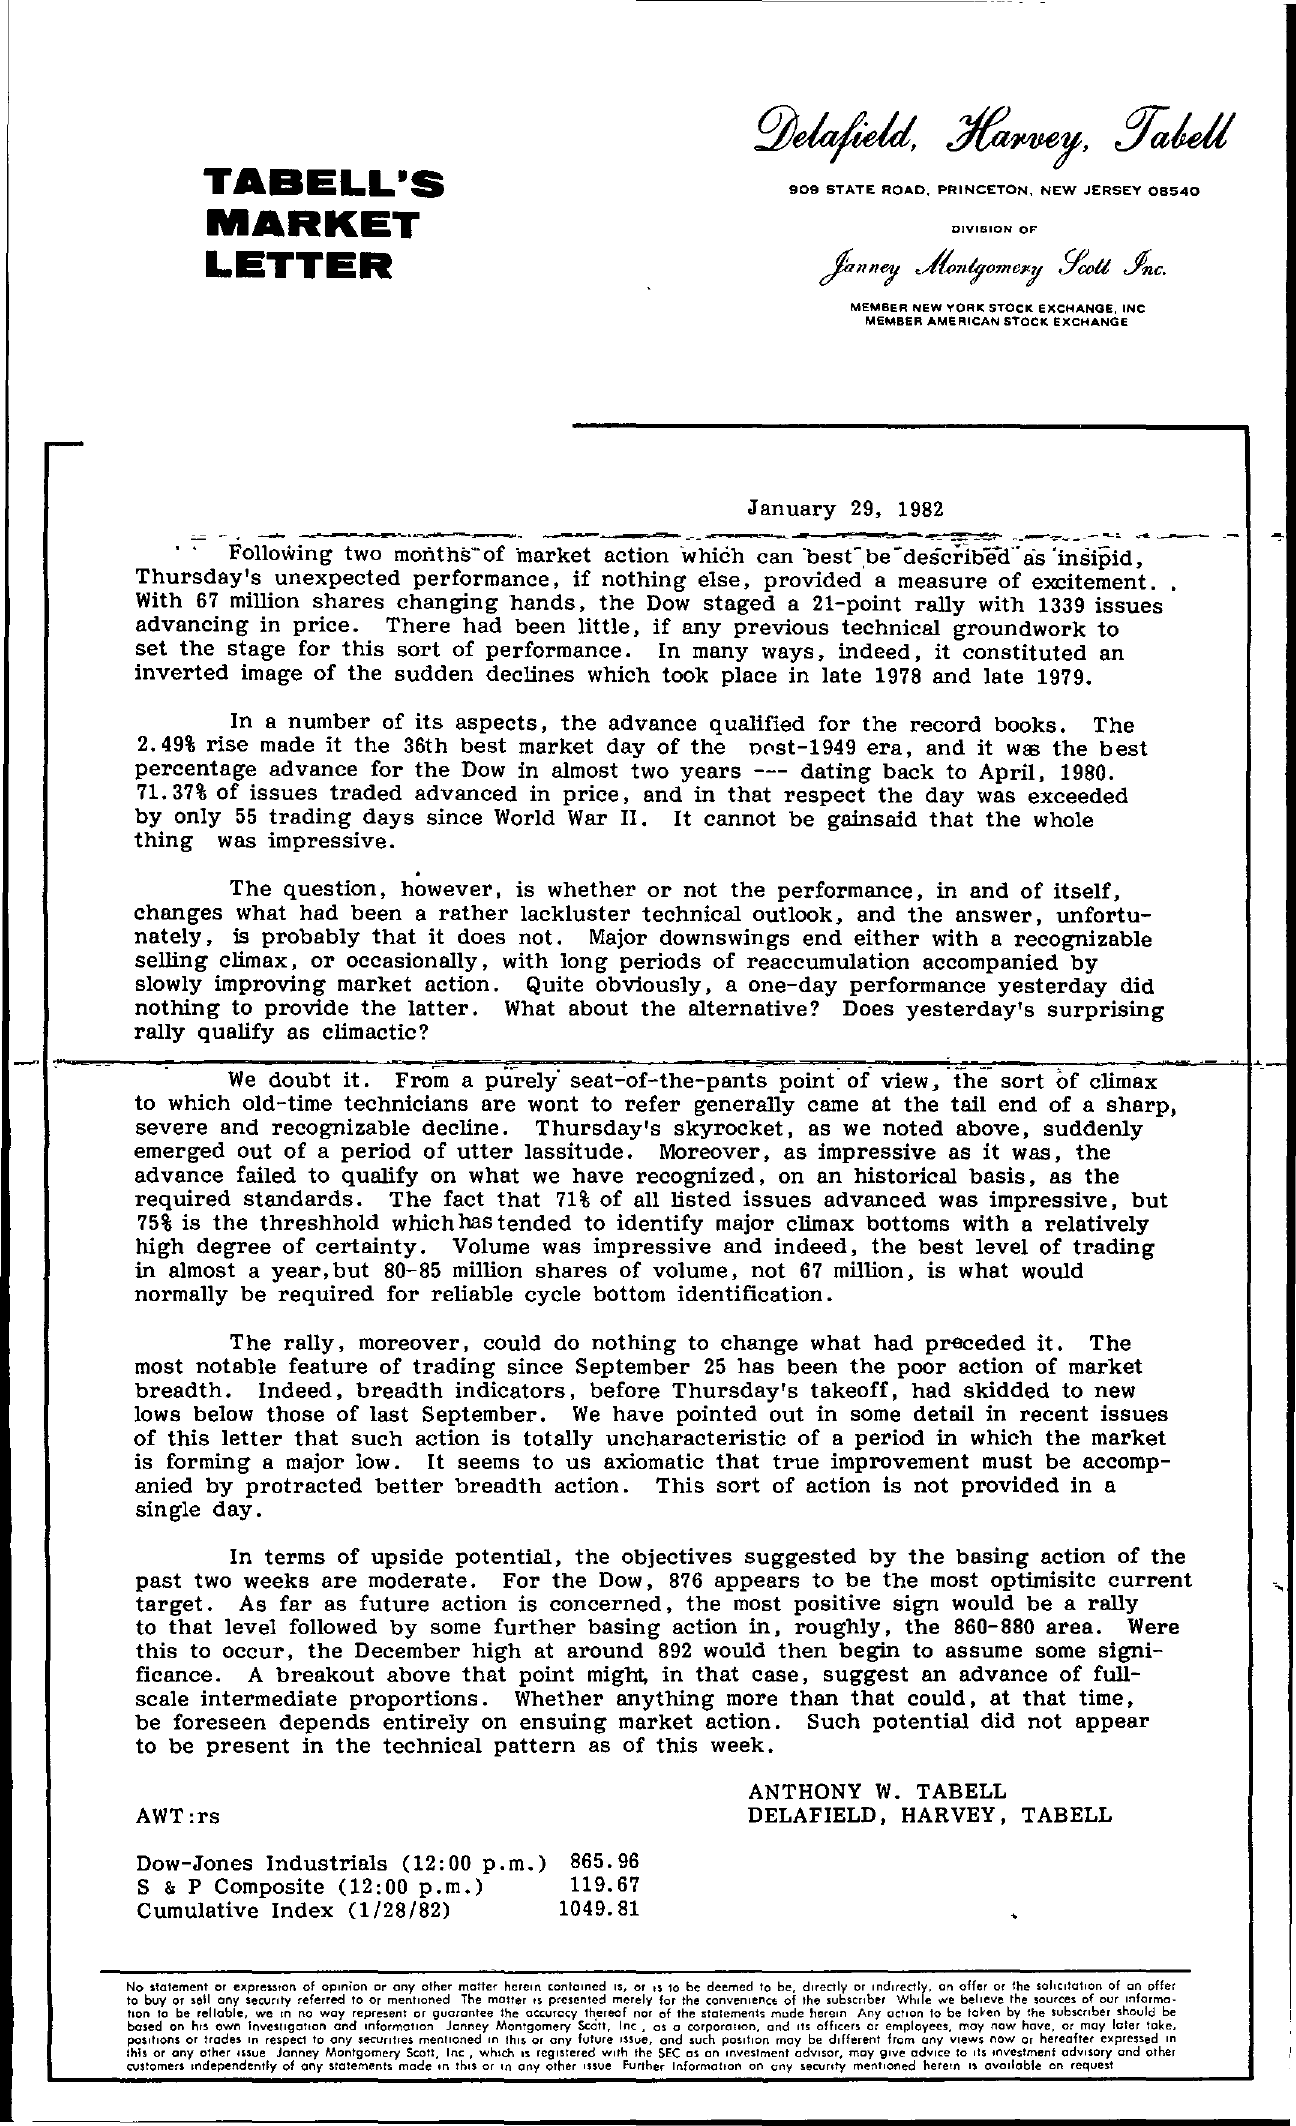 Tabell's Market Letter - January 29, 1982